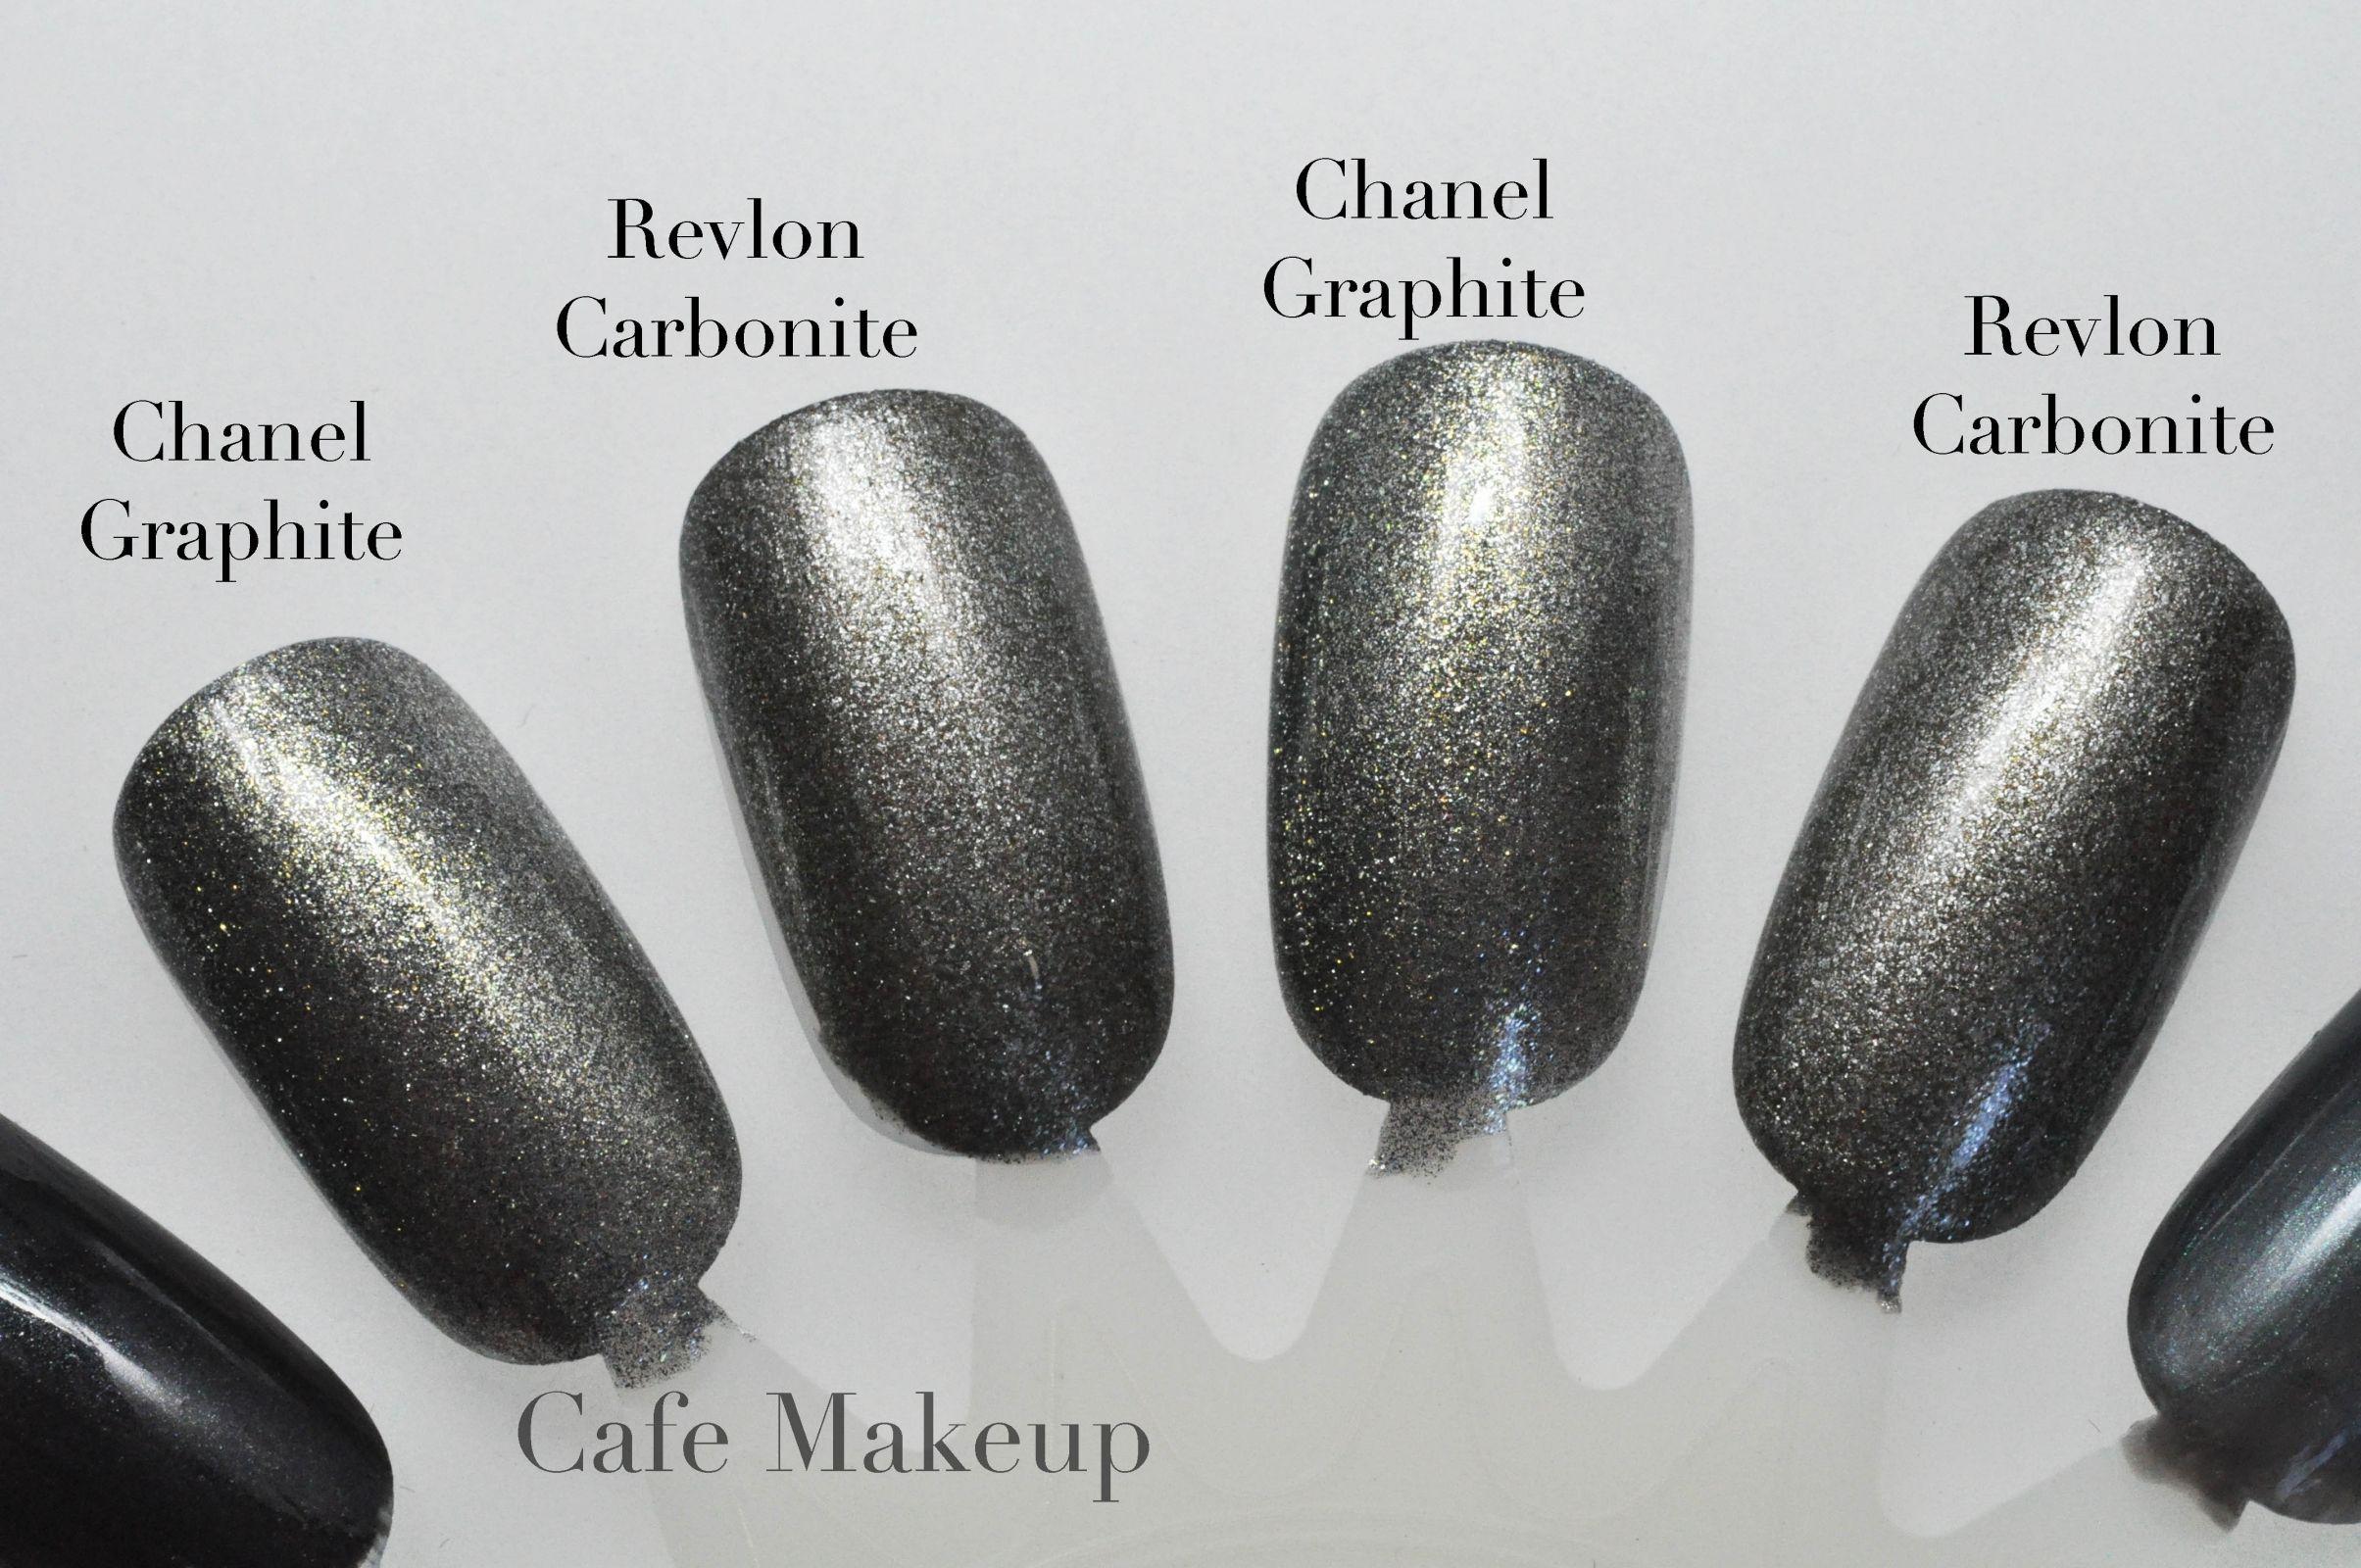 polish dupes images   Revlon nail polish: Carbonite & Dupe   LUUUX